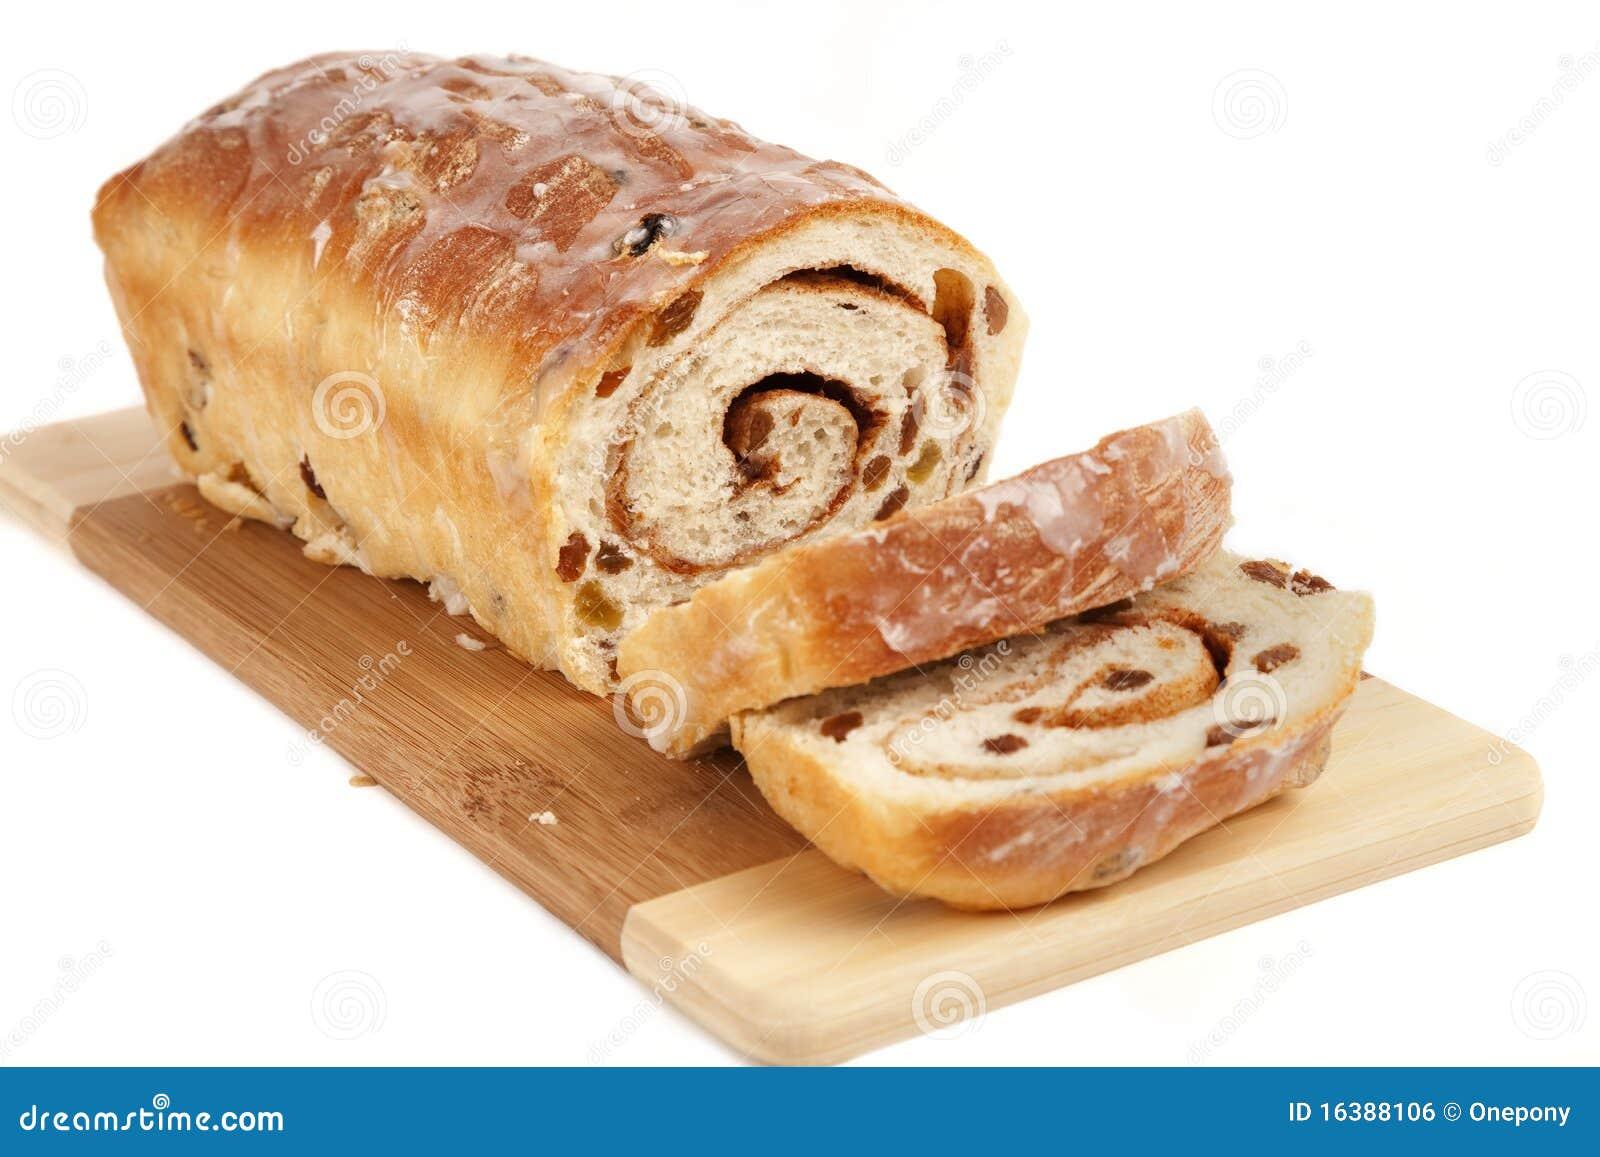 Homemade Cinnamon Raisin Bread Royalty Free Stock Image - Image ...